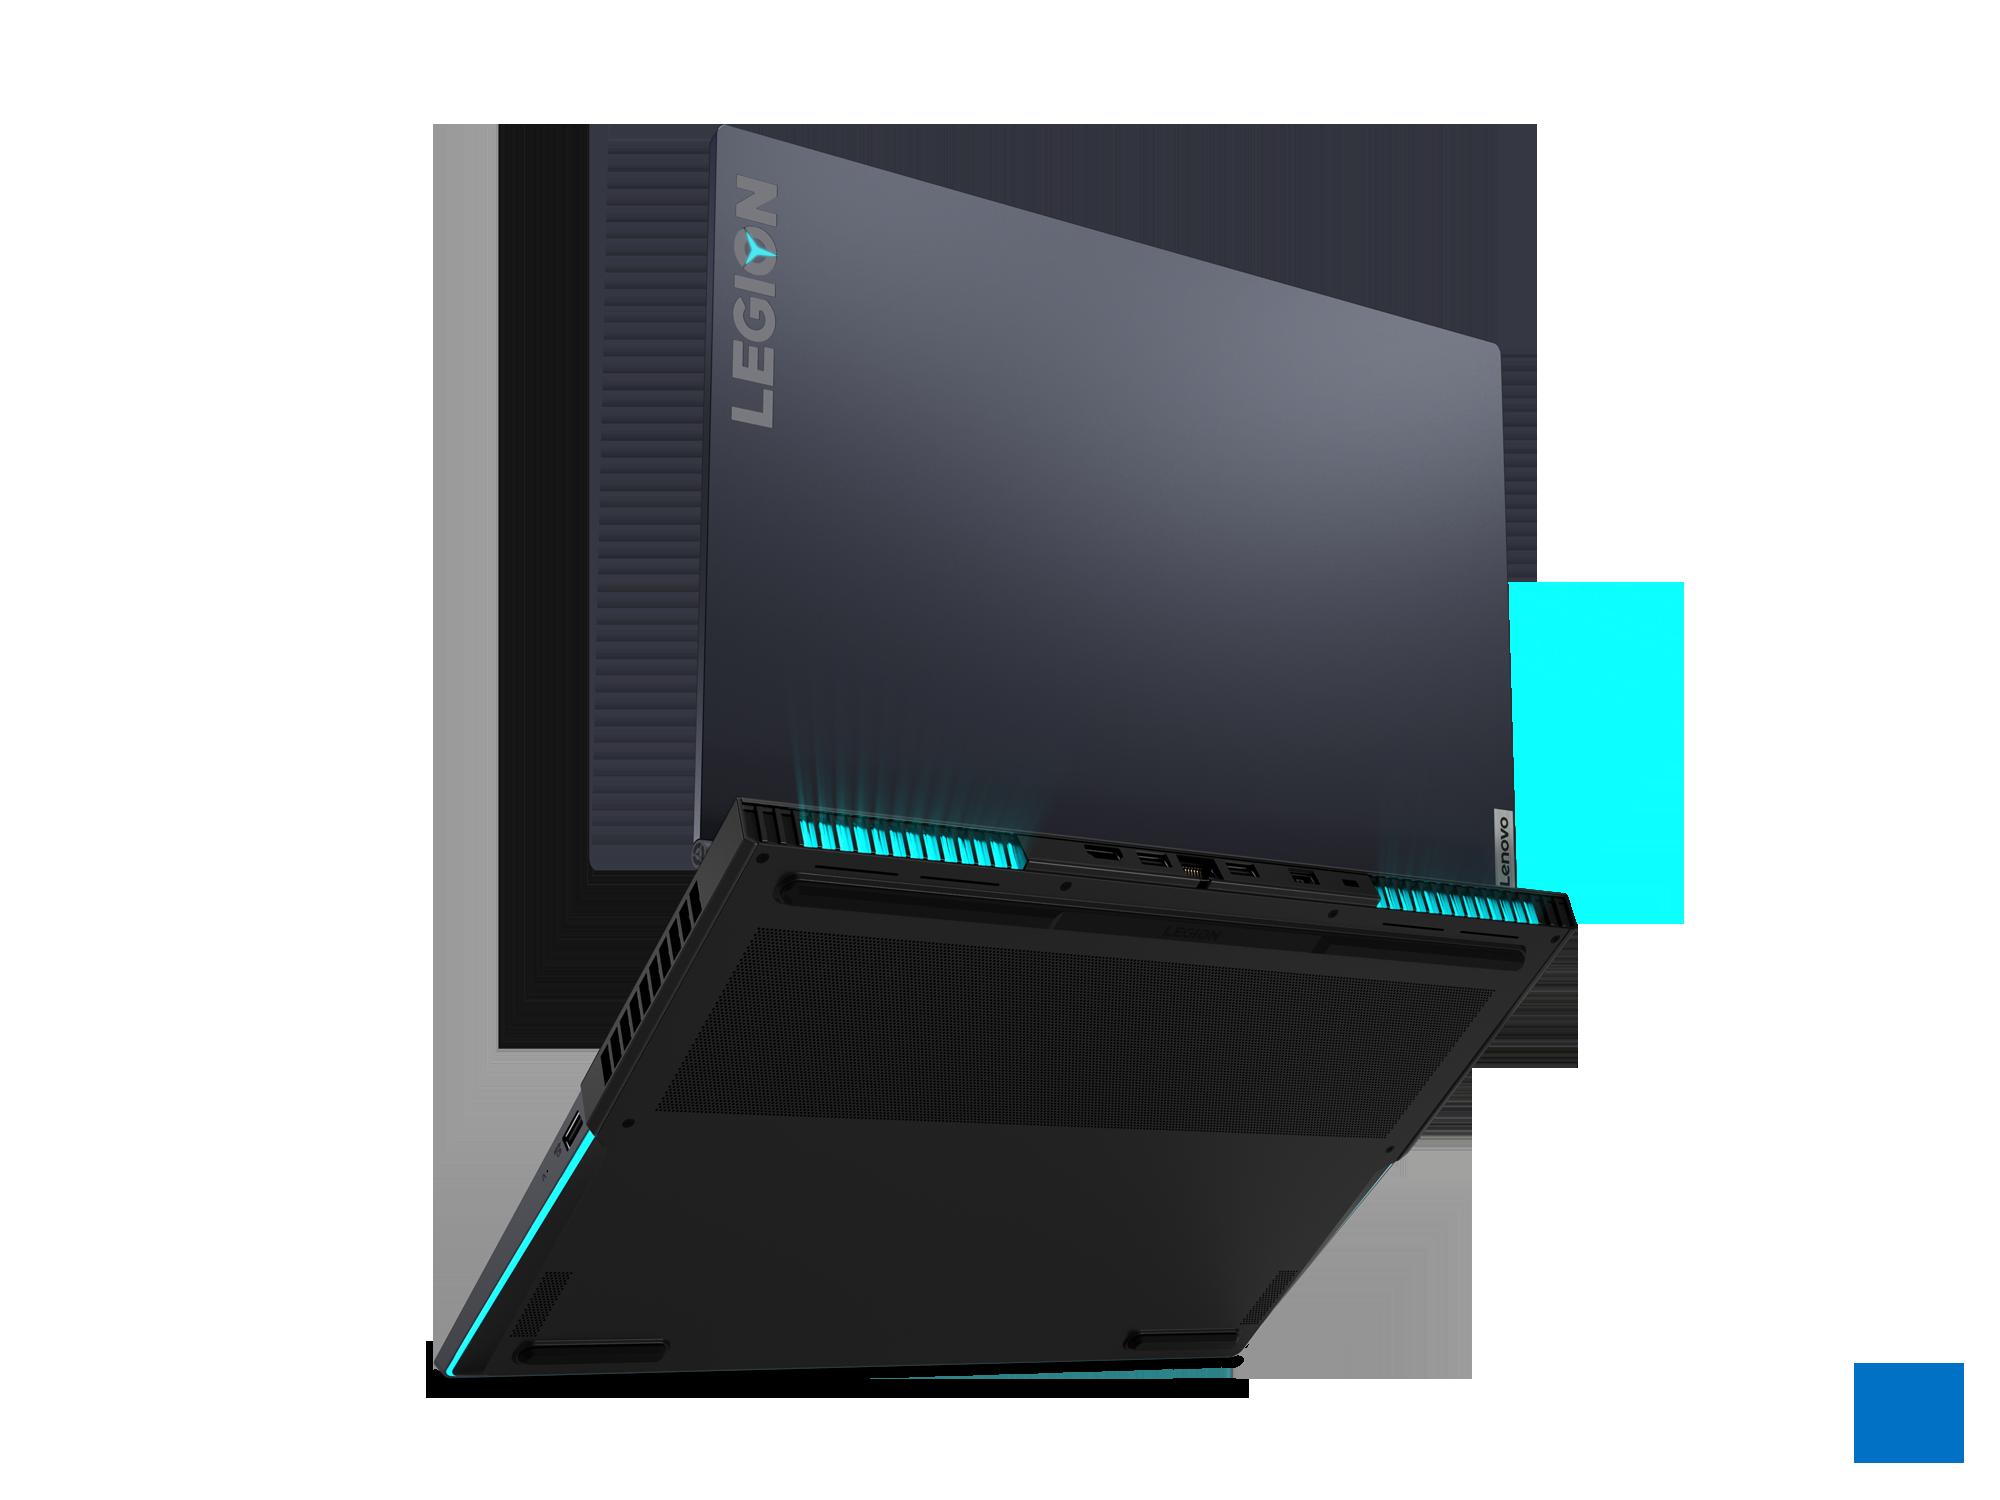 Lenovo Legion Laptop Launch 10th Gen Intel Core And Rtx Super Updates